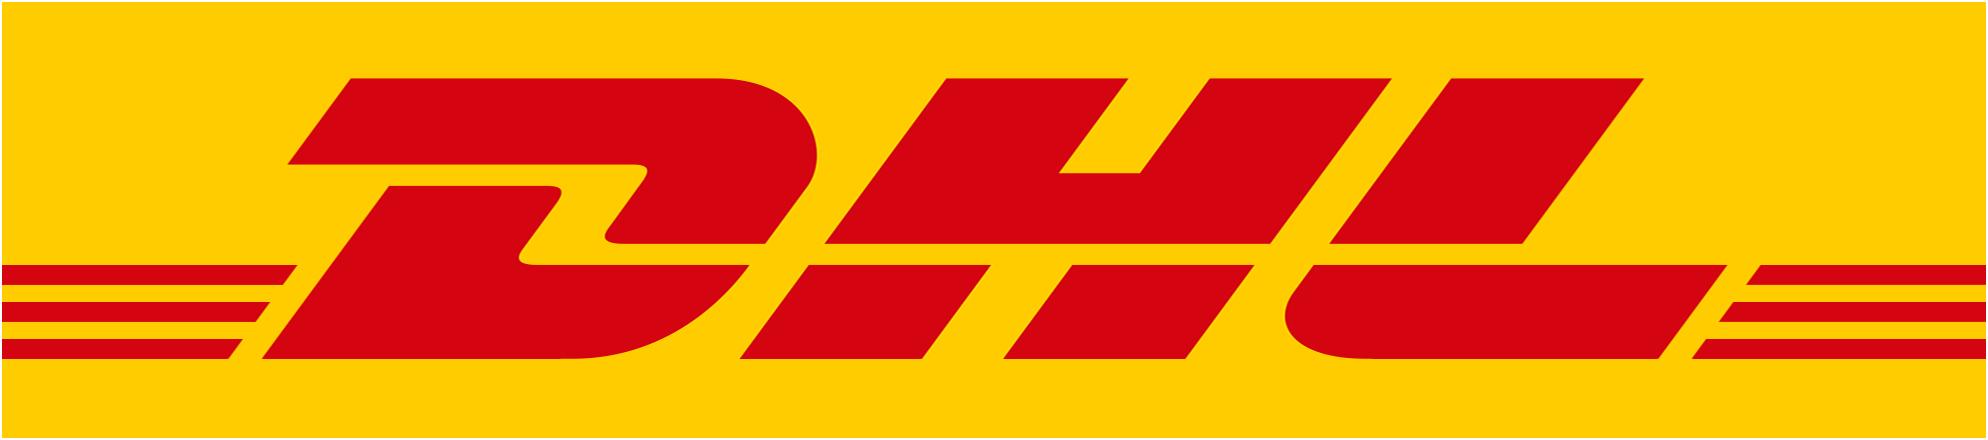 DHL Logistics (Slovakia) spol s.r.o.